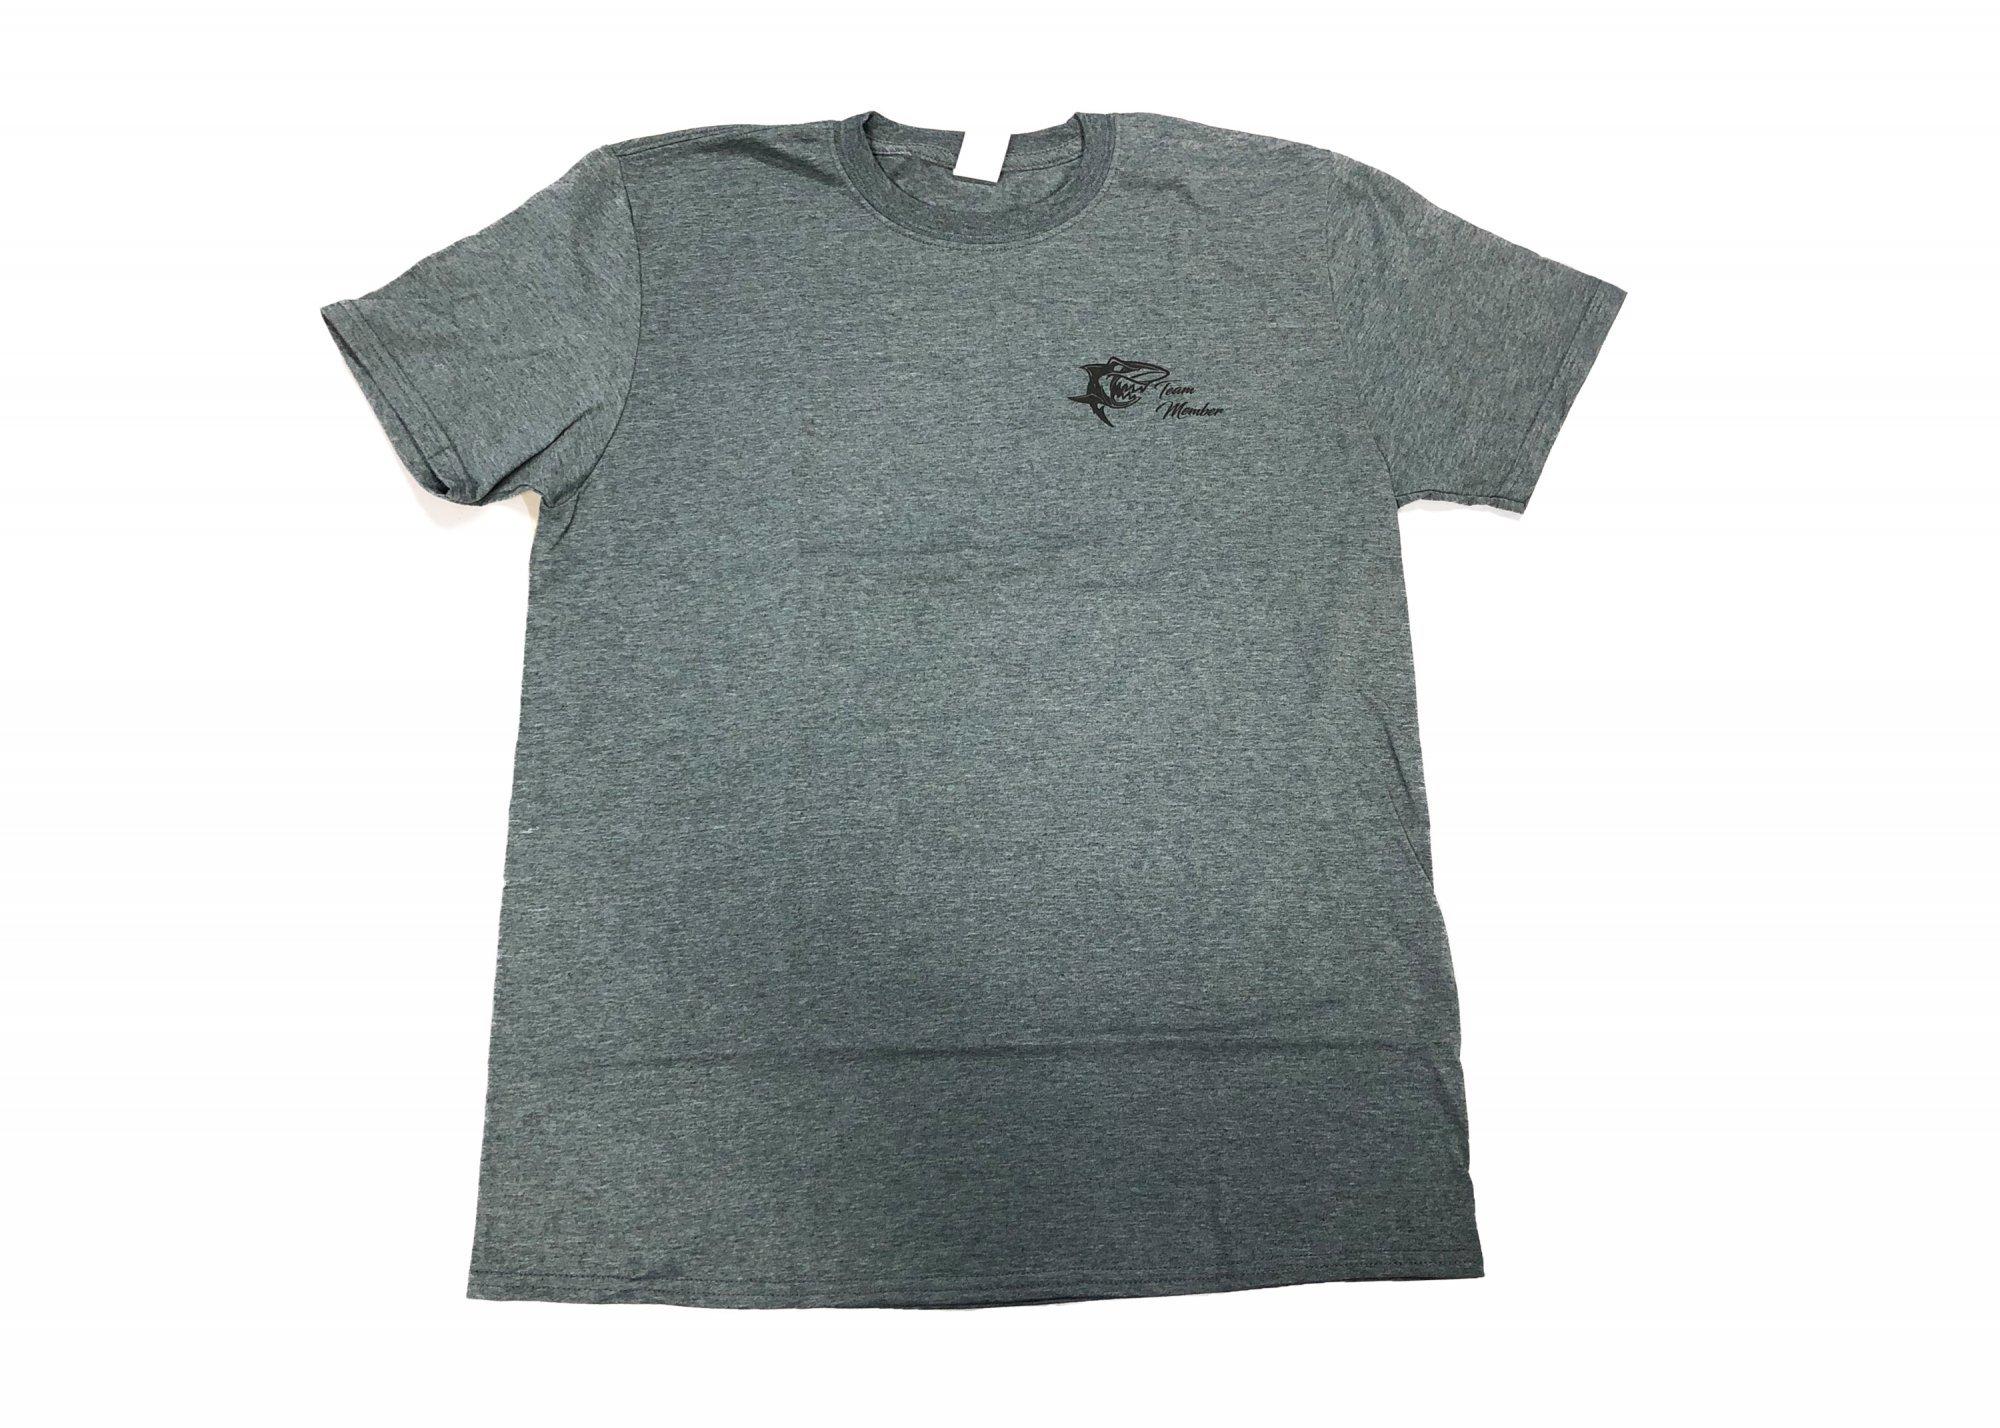 GR8 DIVN - Team Member T-Shirt